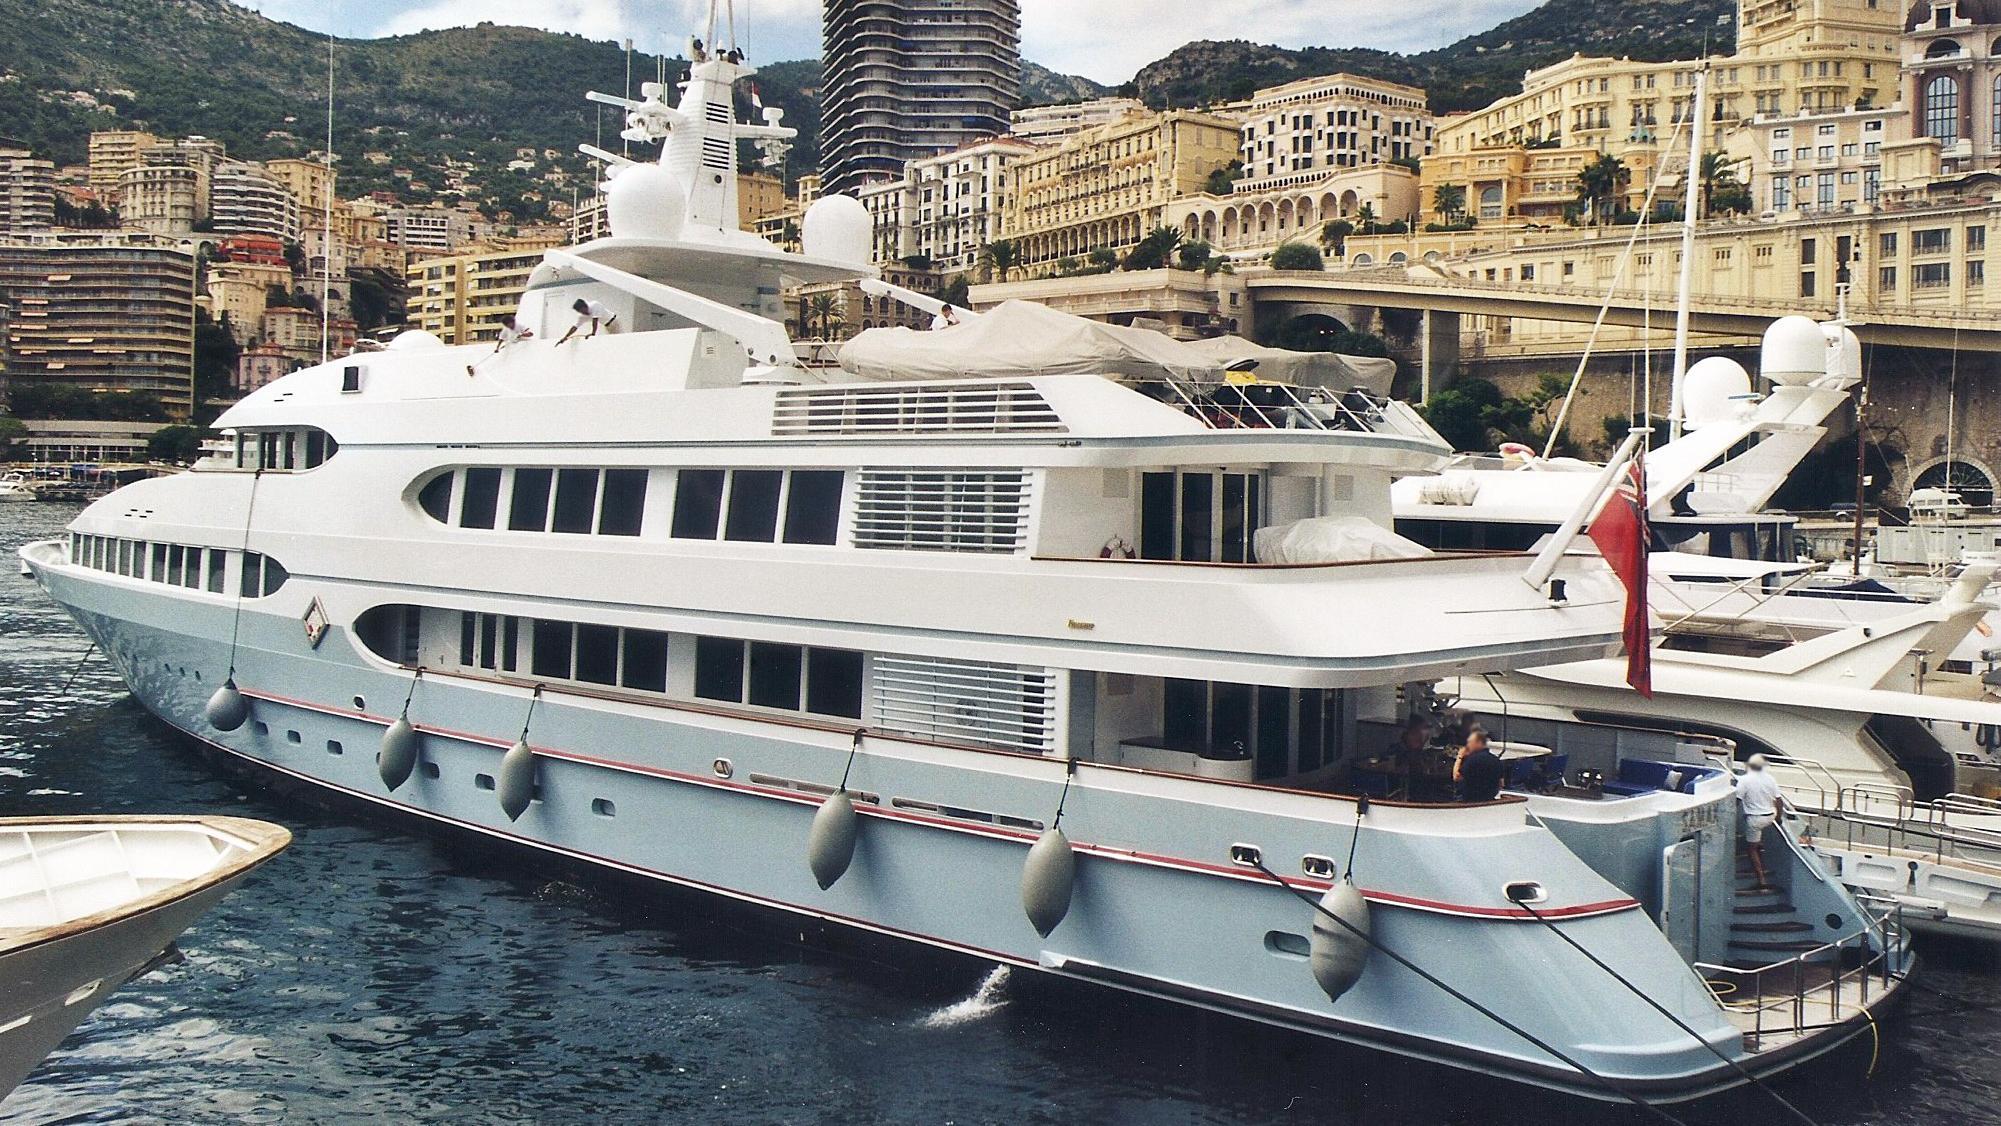 samax-motor-yacht-feadship-1996-55m-stern-profile